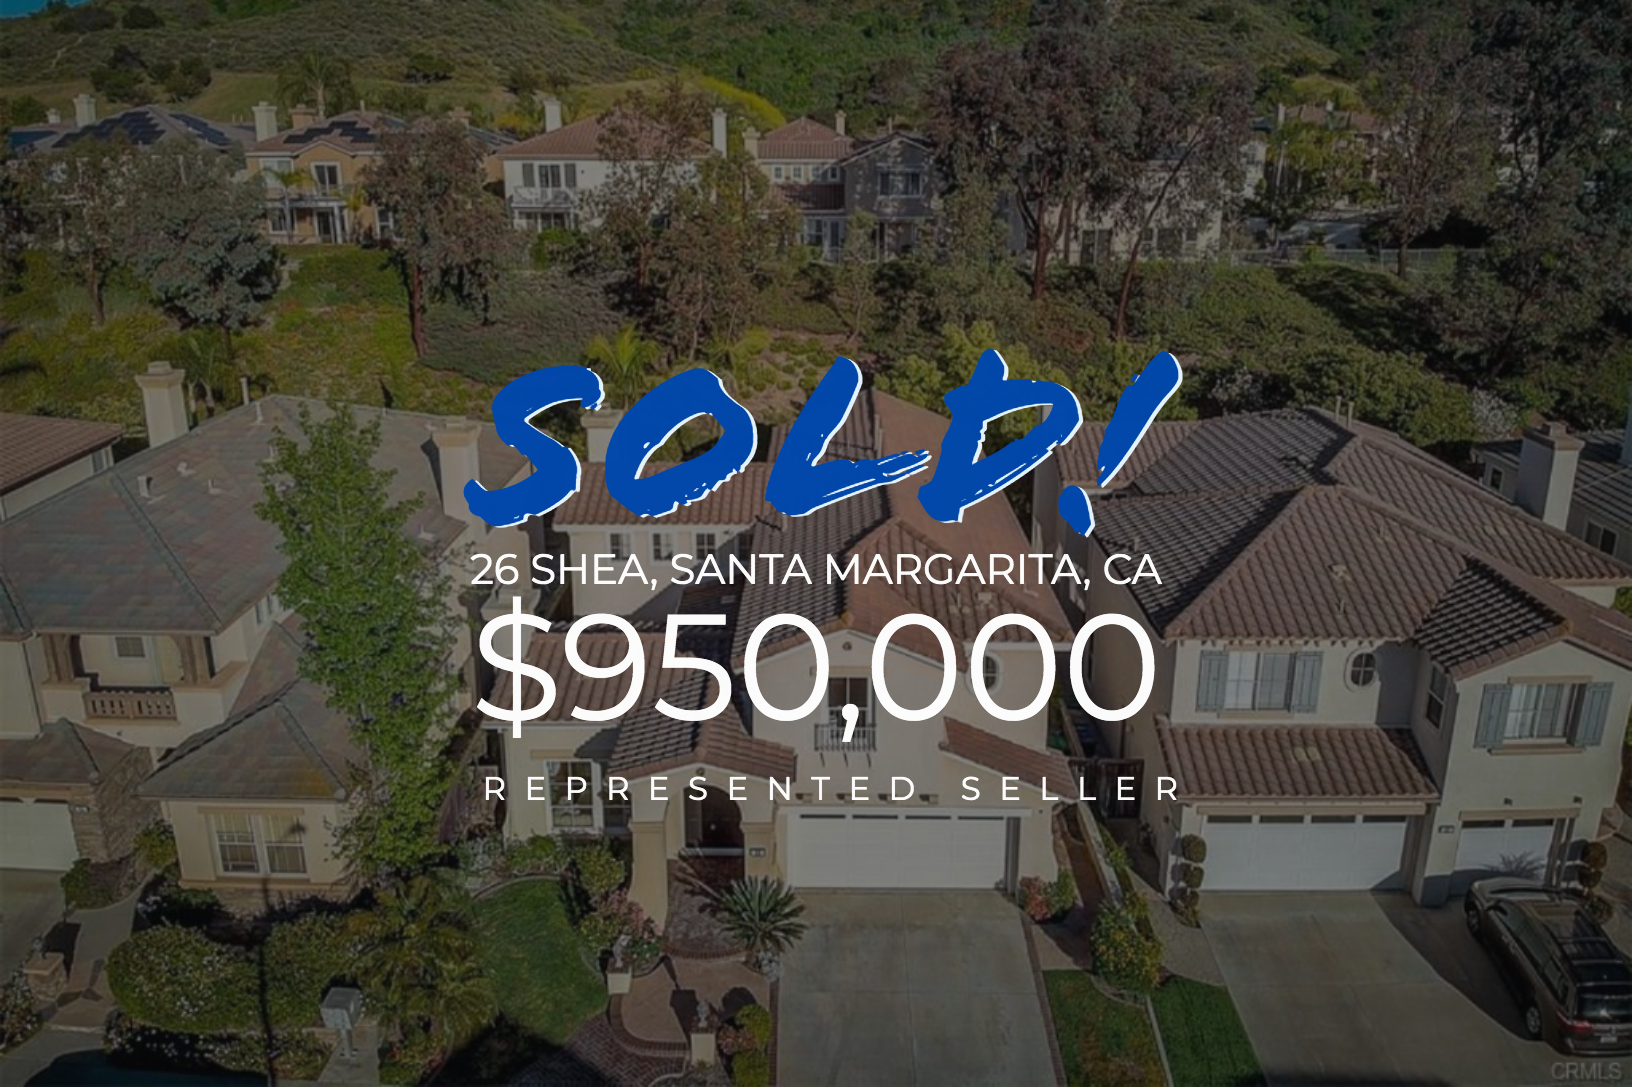 Sold With Matt Blashaw 26 Shea in Santa Margarita, CA